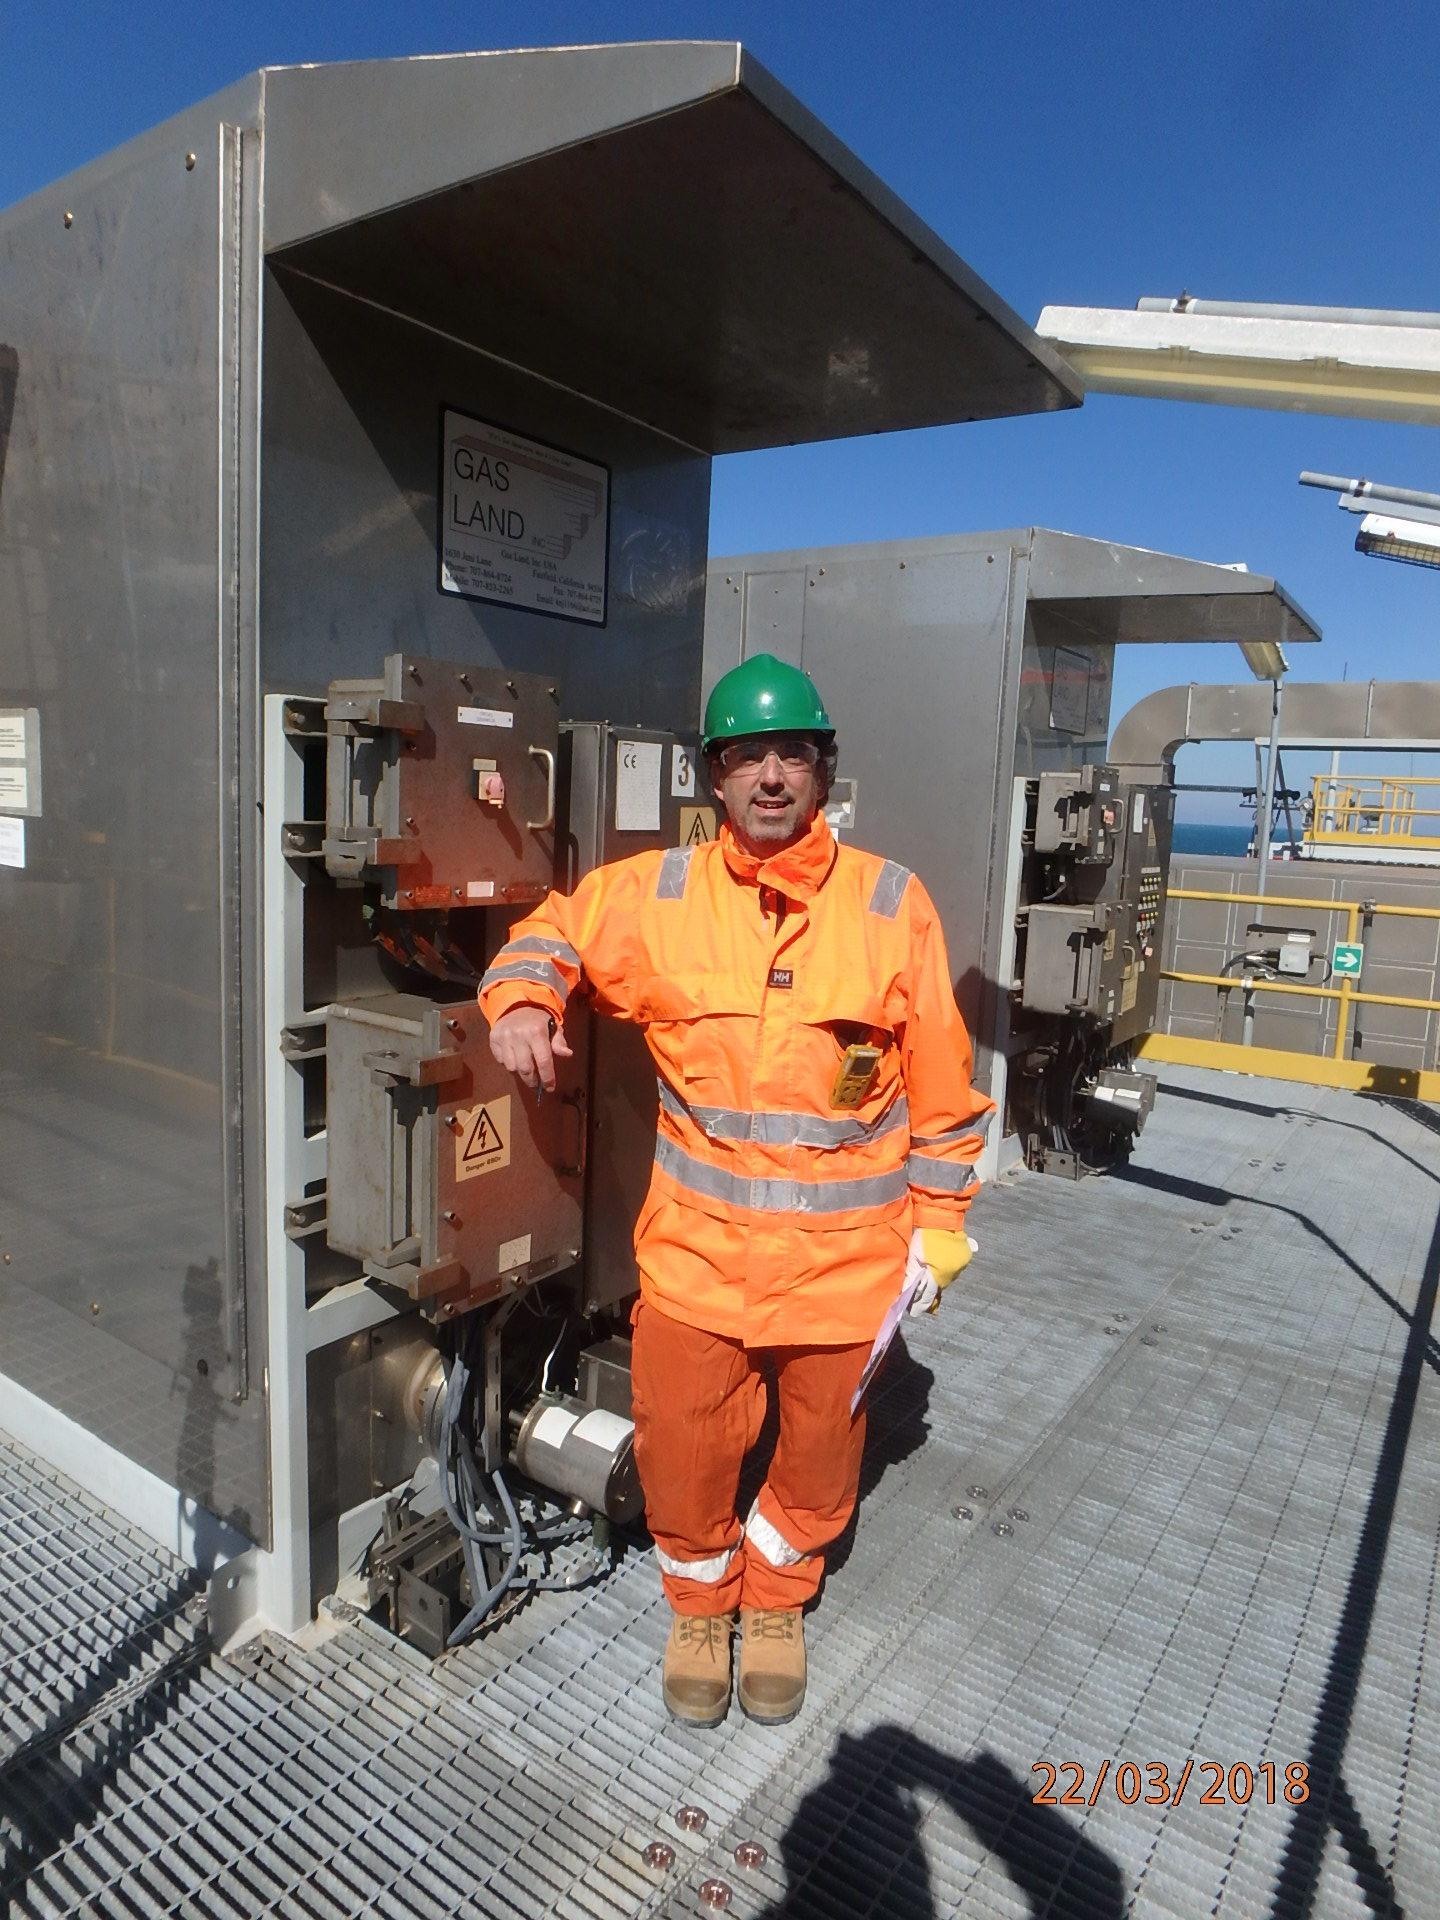 CEO Khalil N. Jaber, Jr., with Gas Land's Nitrogen Generation Systems